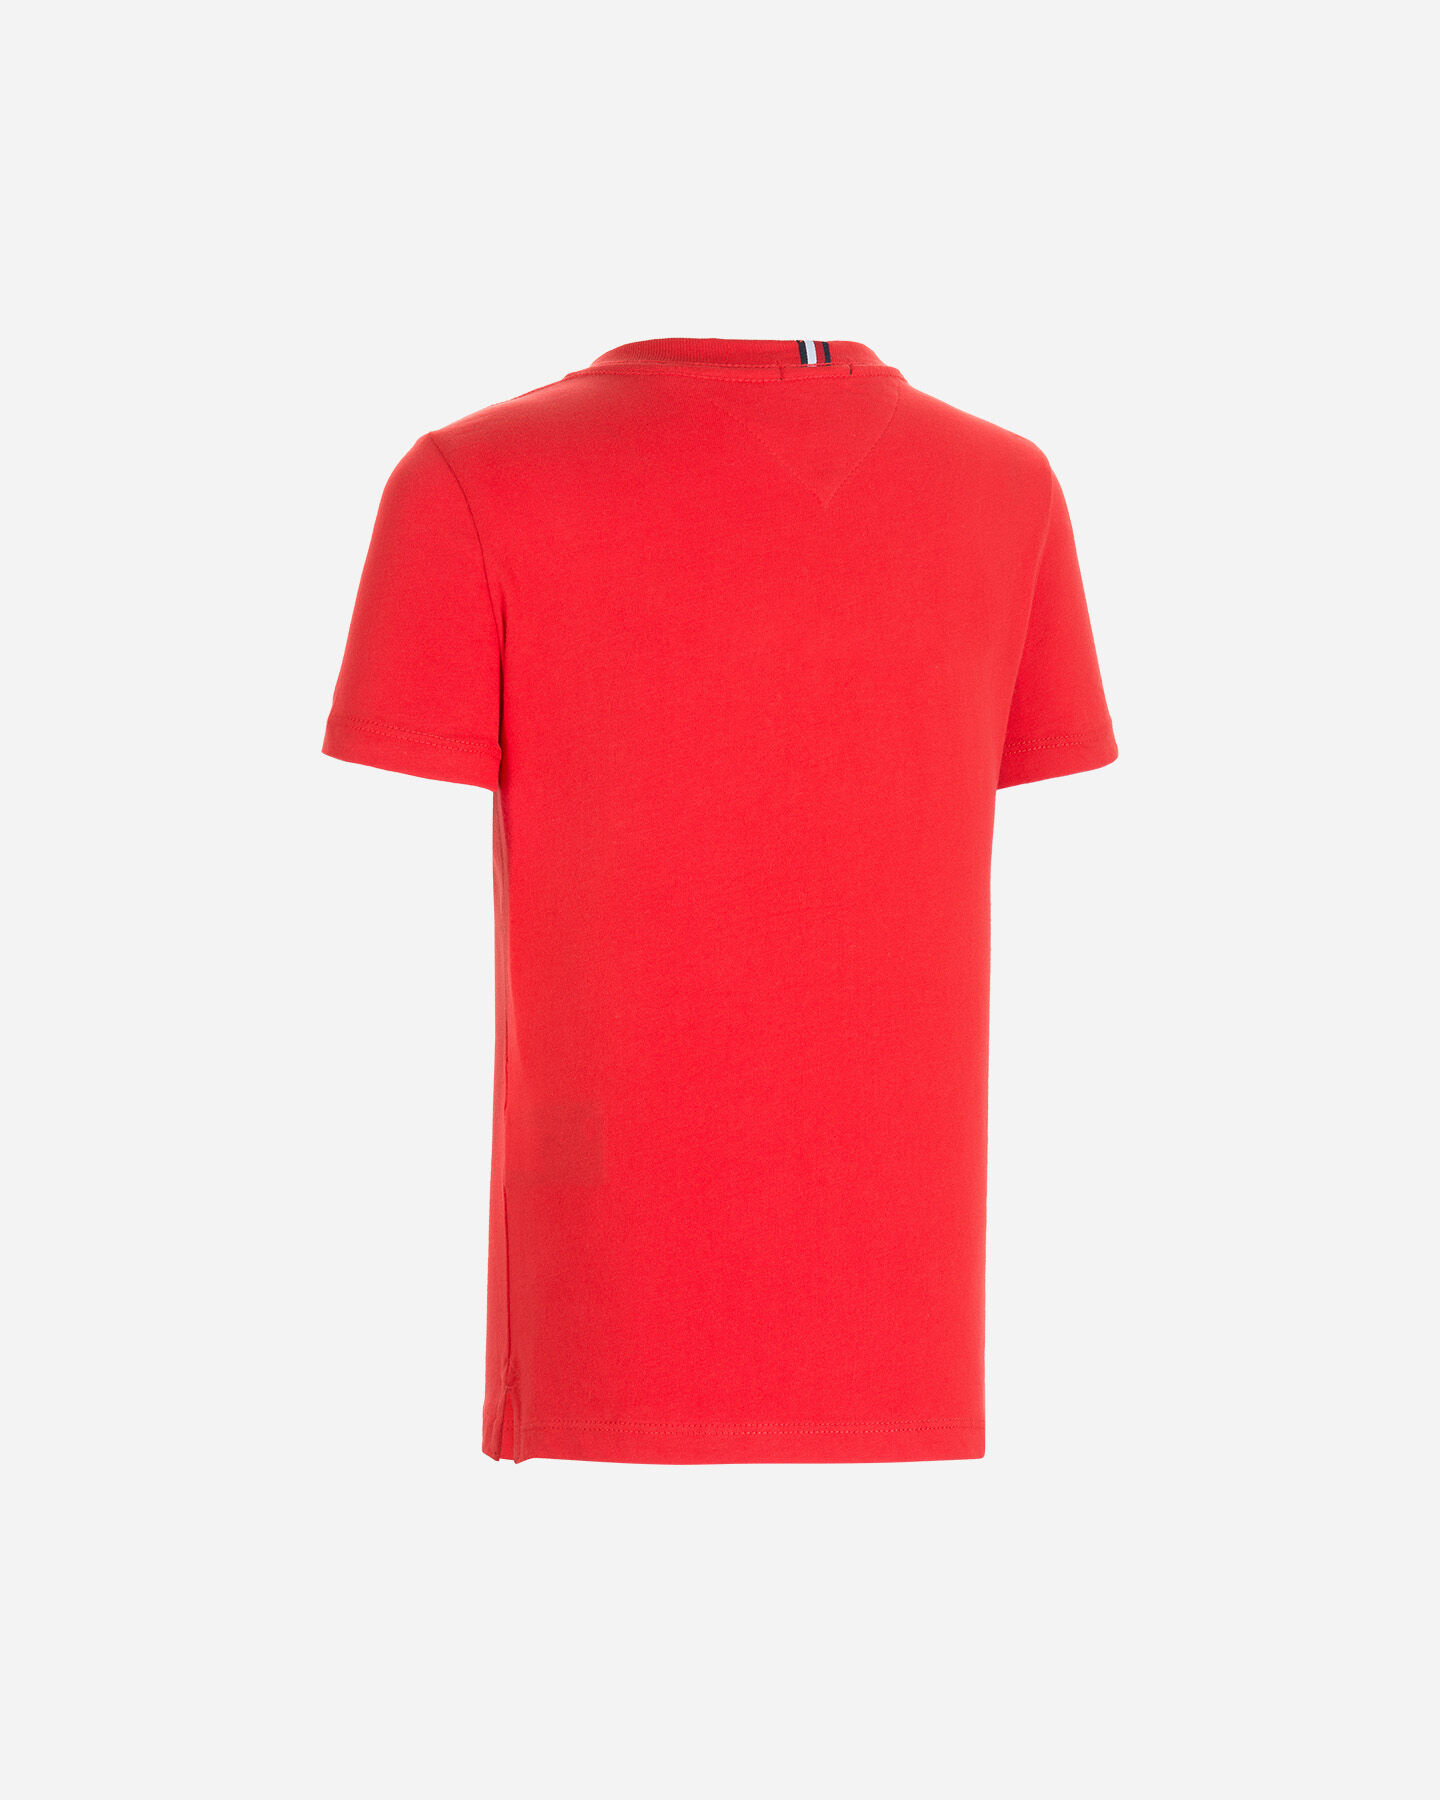 T-Shirt TOMMY HILFIGER LOGO LETTERING JR S4083619 scatto 1